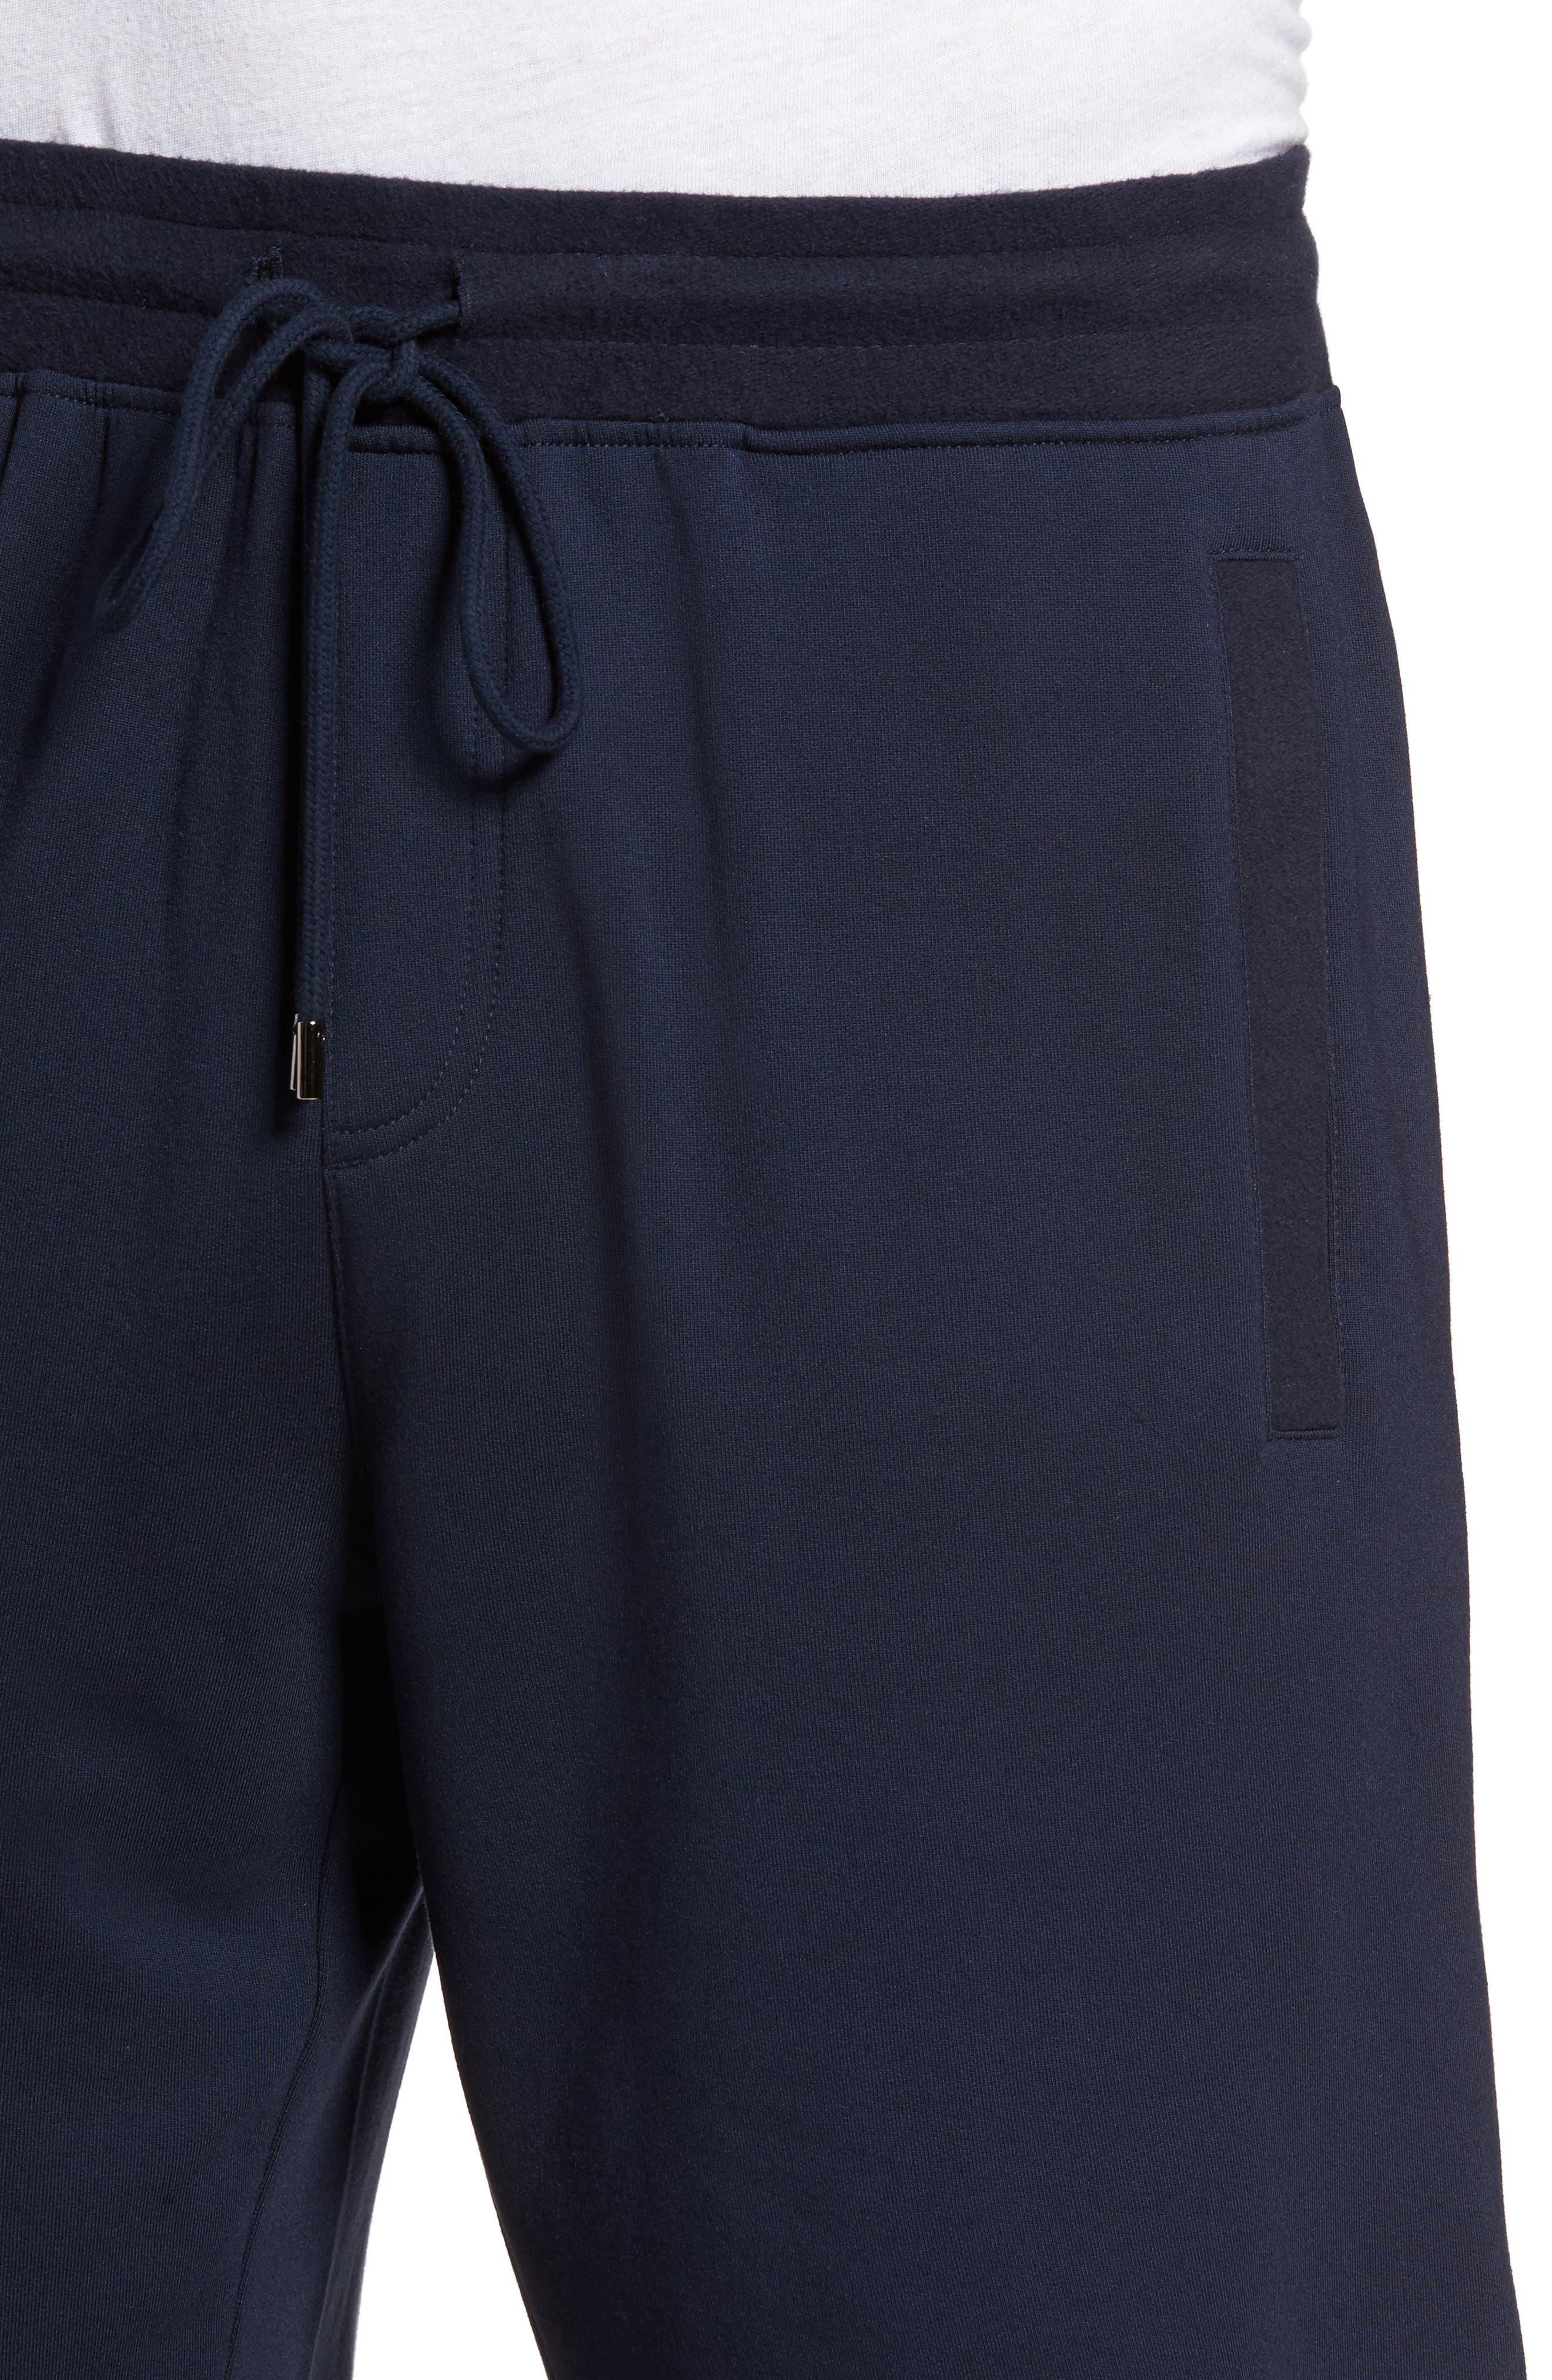 Modal Blend Lounge Shorts,                             Alternate thumbnail 4, color,                             Ink